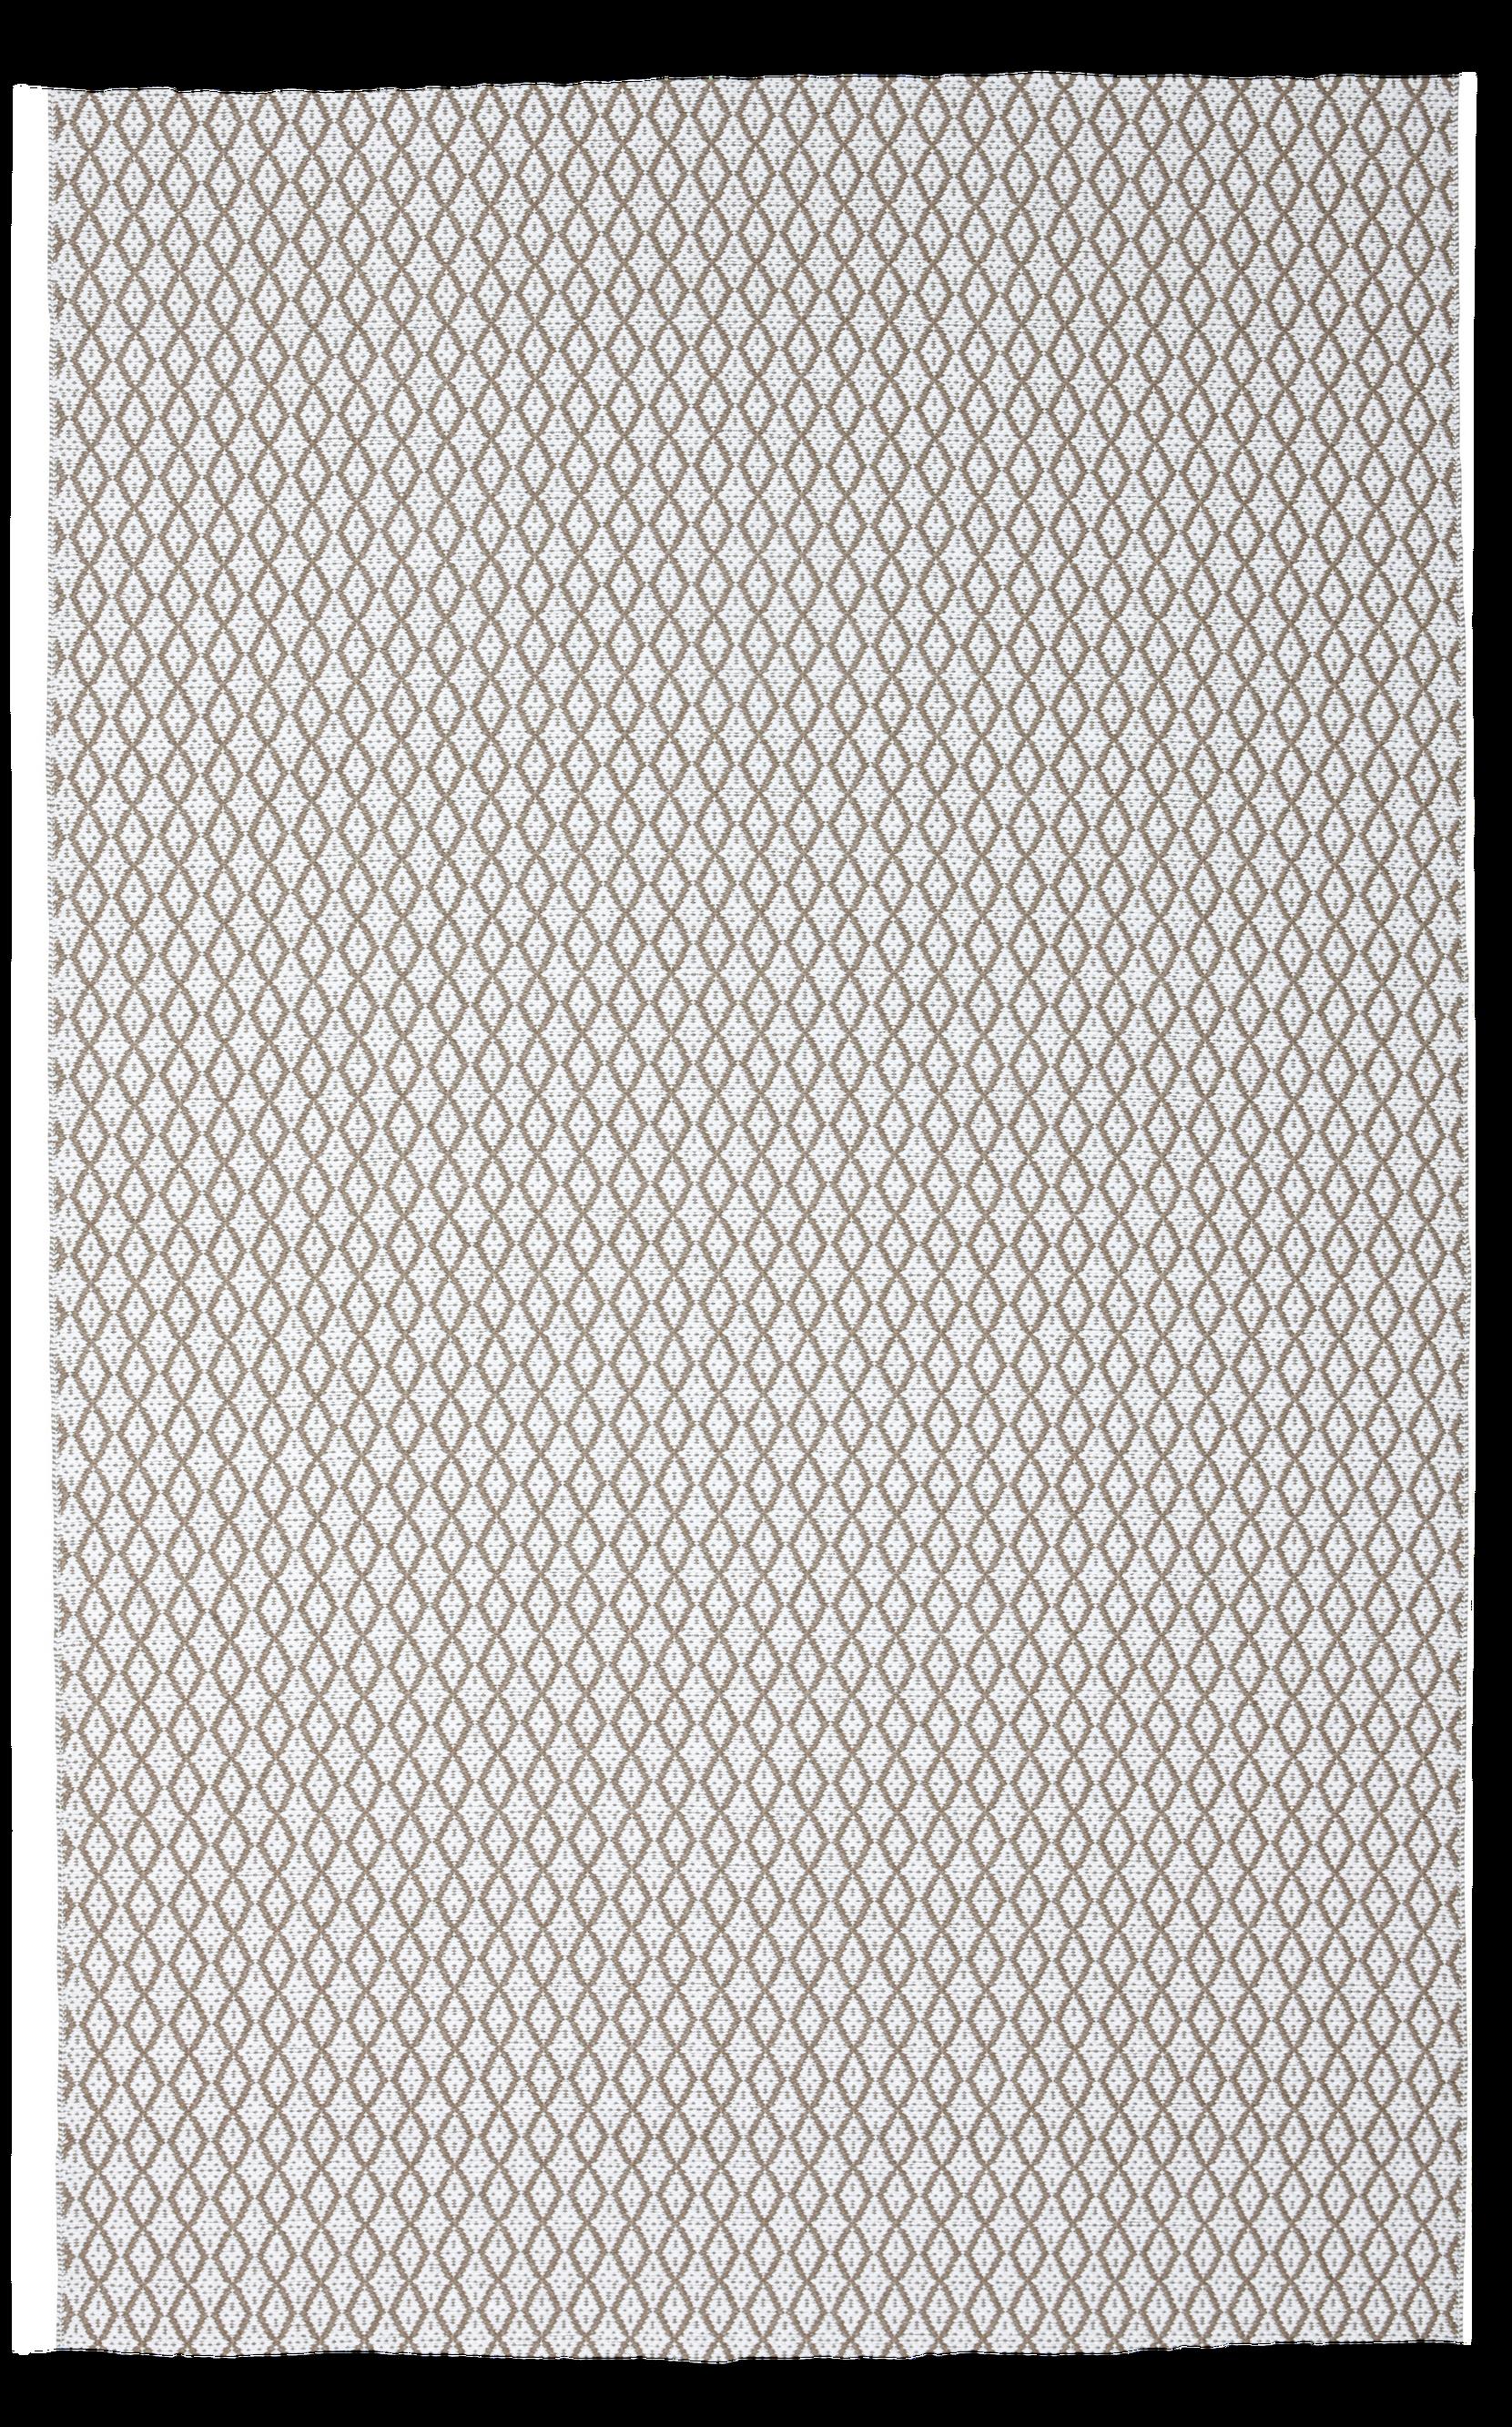 Horredsmattan - Plastmatta Eye 200 x 250 cm - Natur